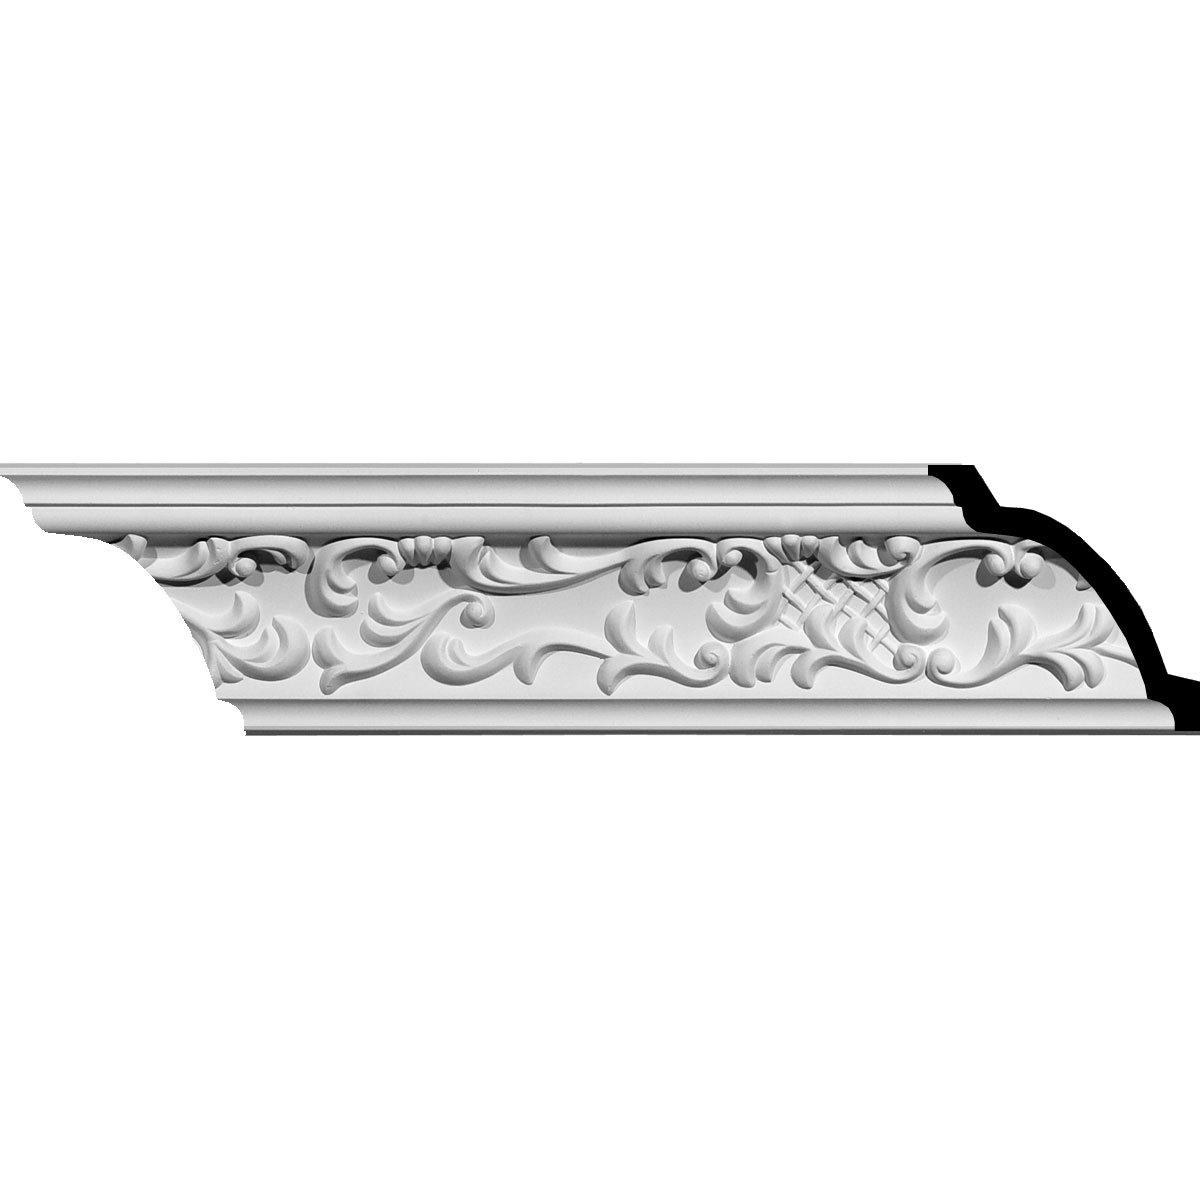 "Ekena Millwork MLD03X03X05SG-CASE-2 Strasbourg Crown Moulding (2-Pack), 3 5/8""H x 3 5/8""P x 5 1/4""F x 94 1/2""L, Factory Primed"